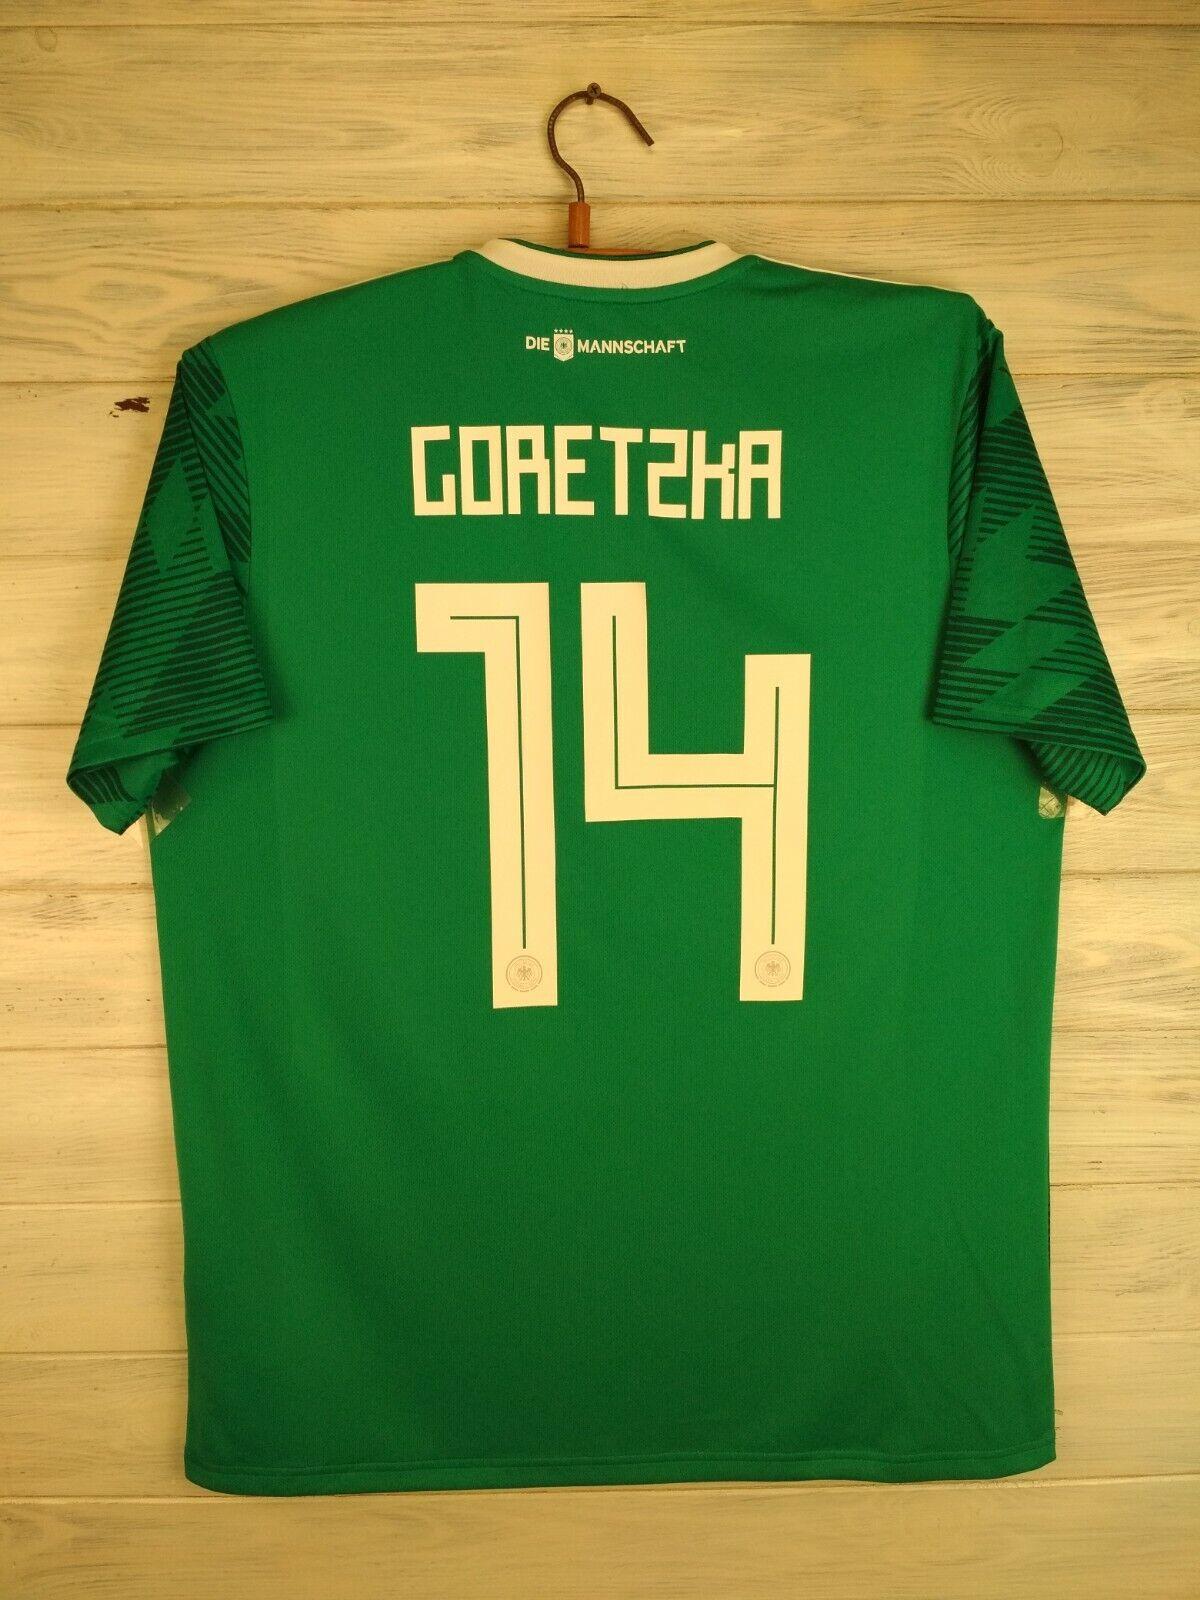 Goretzka Germany soccer jersey large 2019 away shirt BR3144 football Adidas